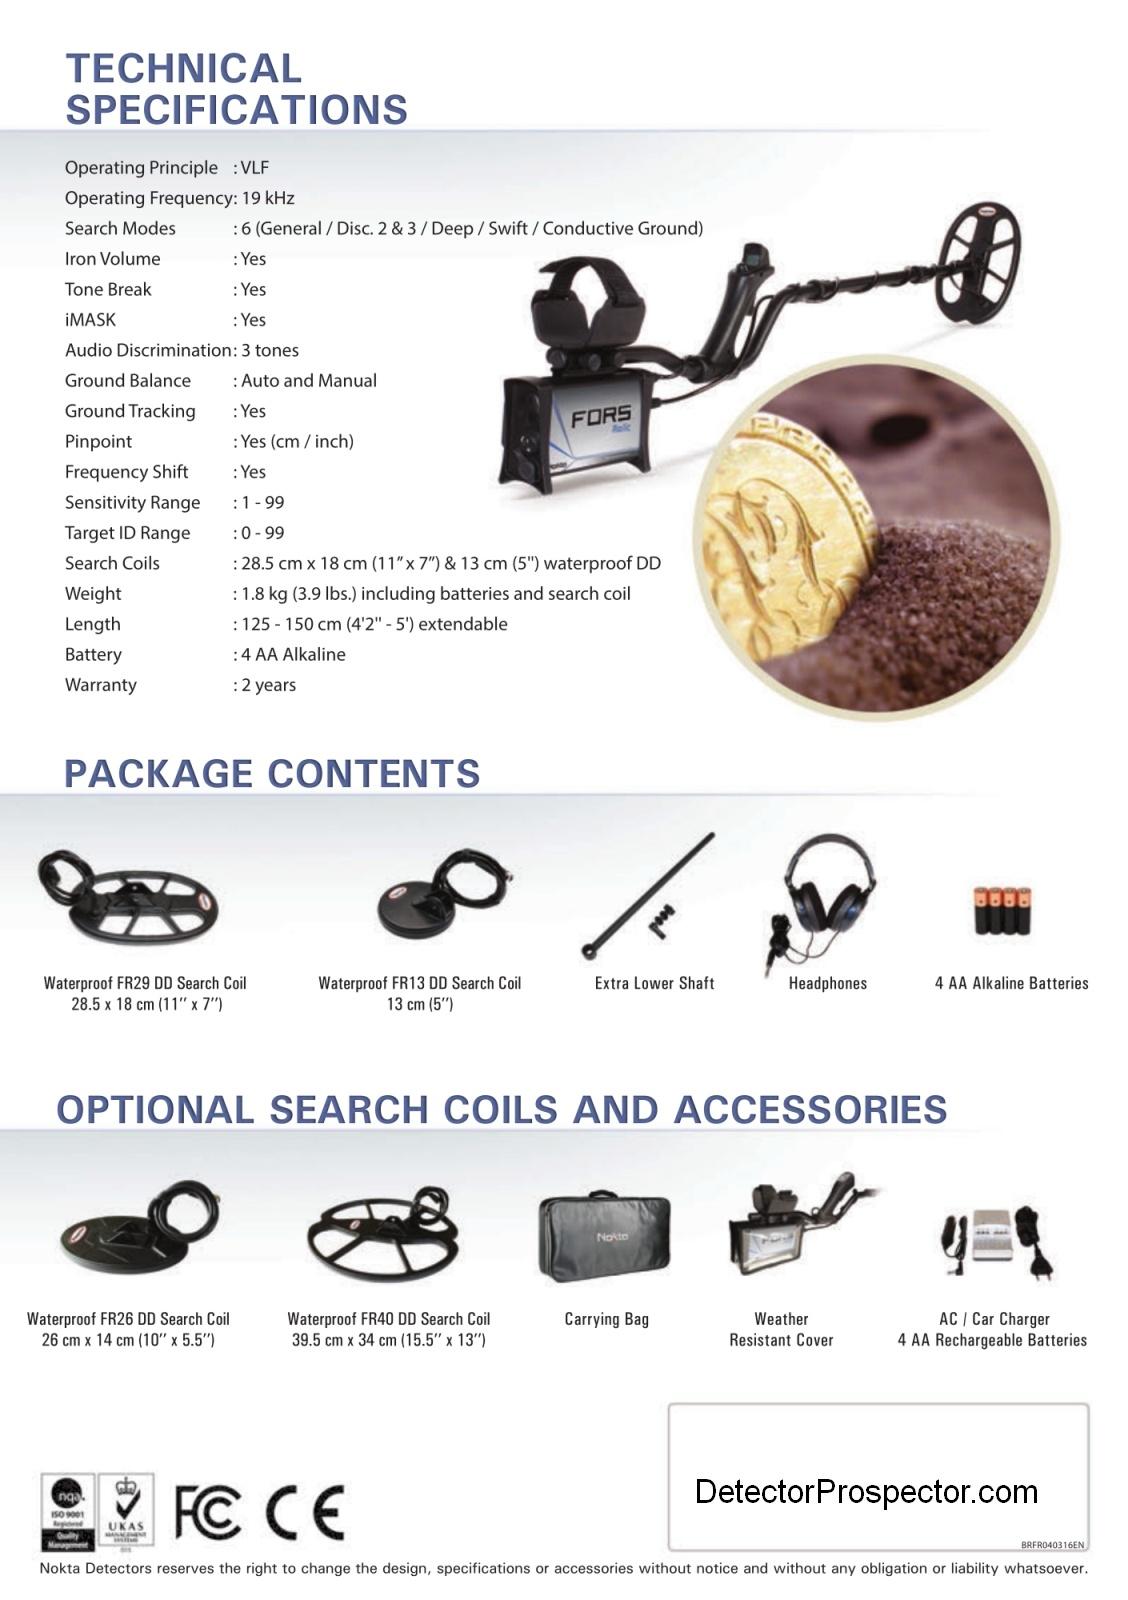 nokta-fors-relic-brochure-page-4.jpg